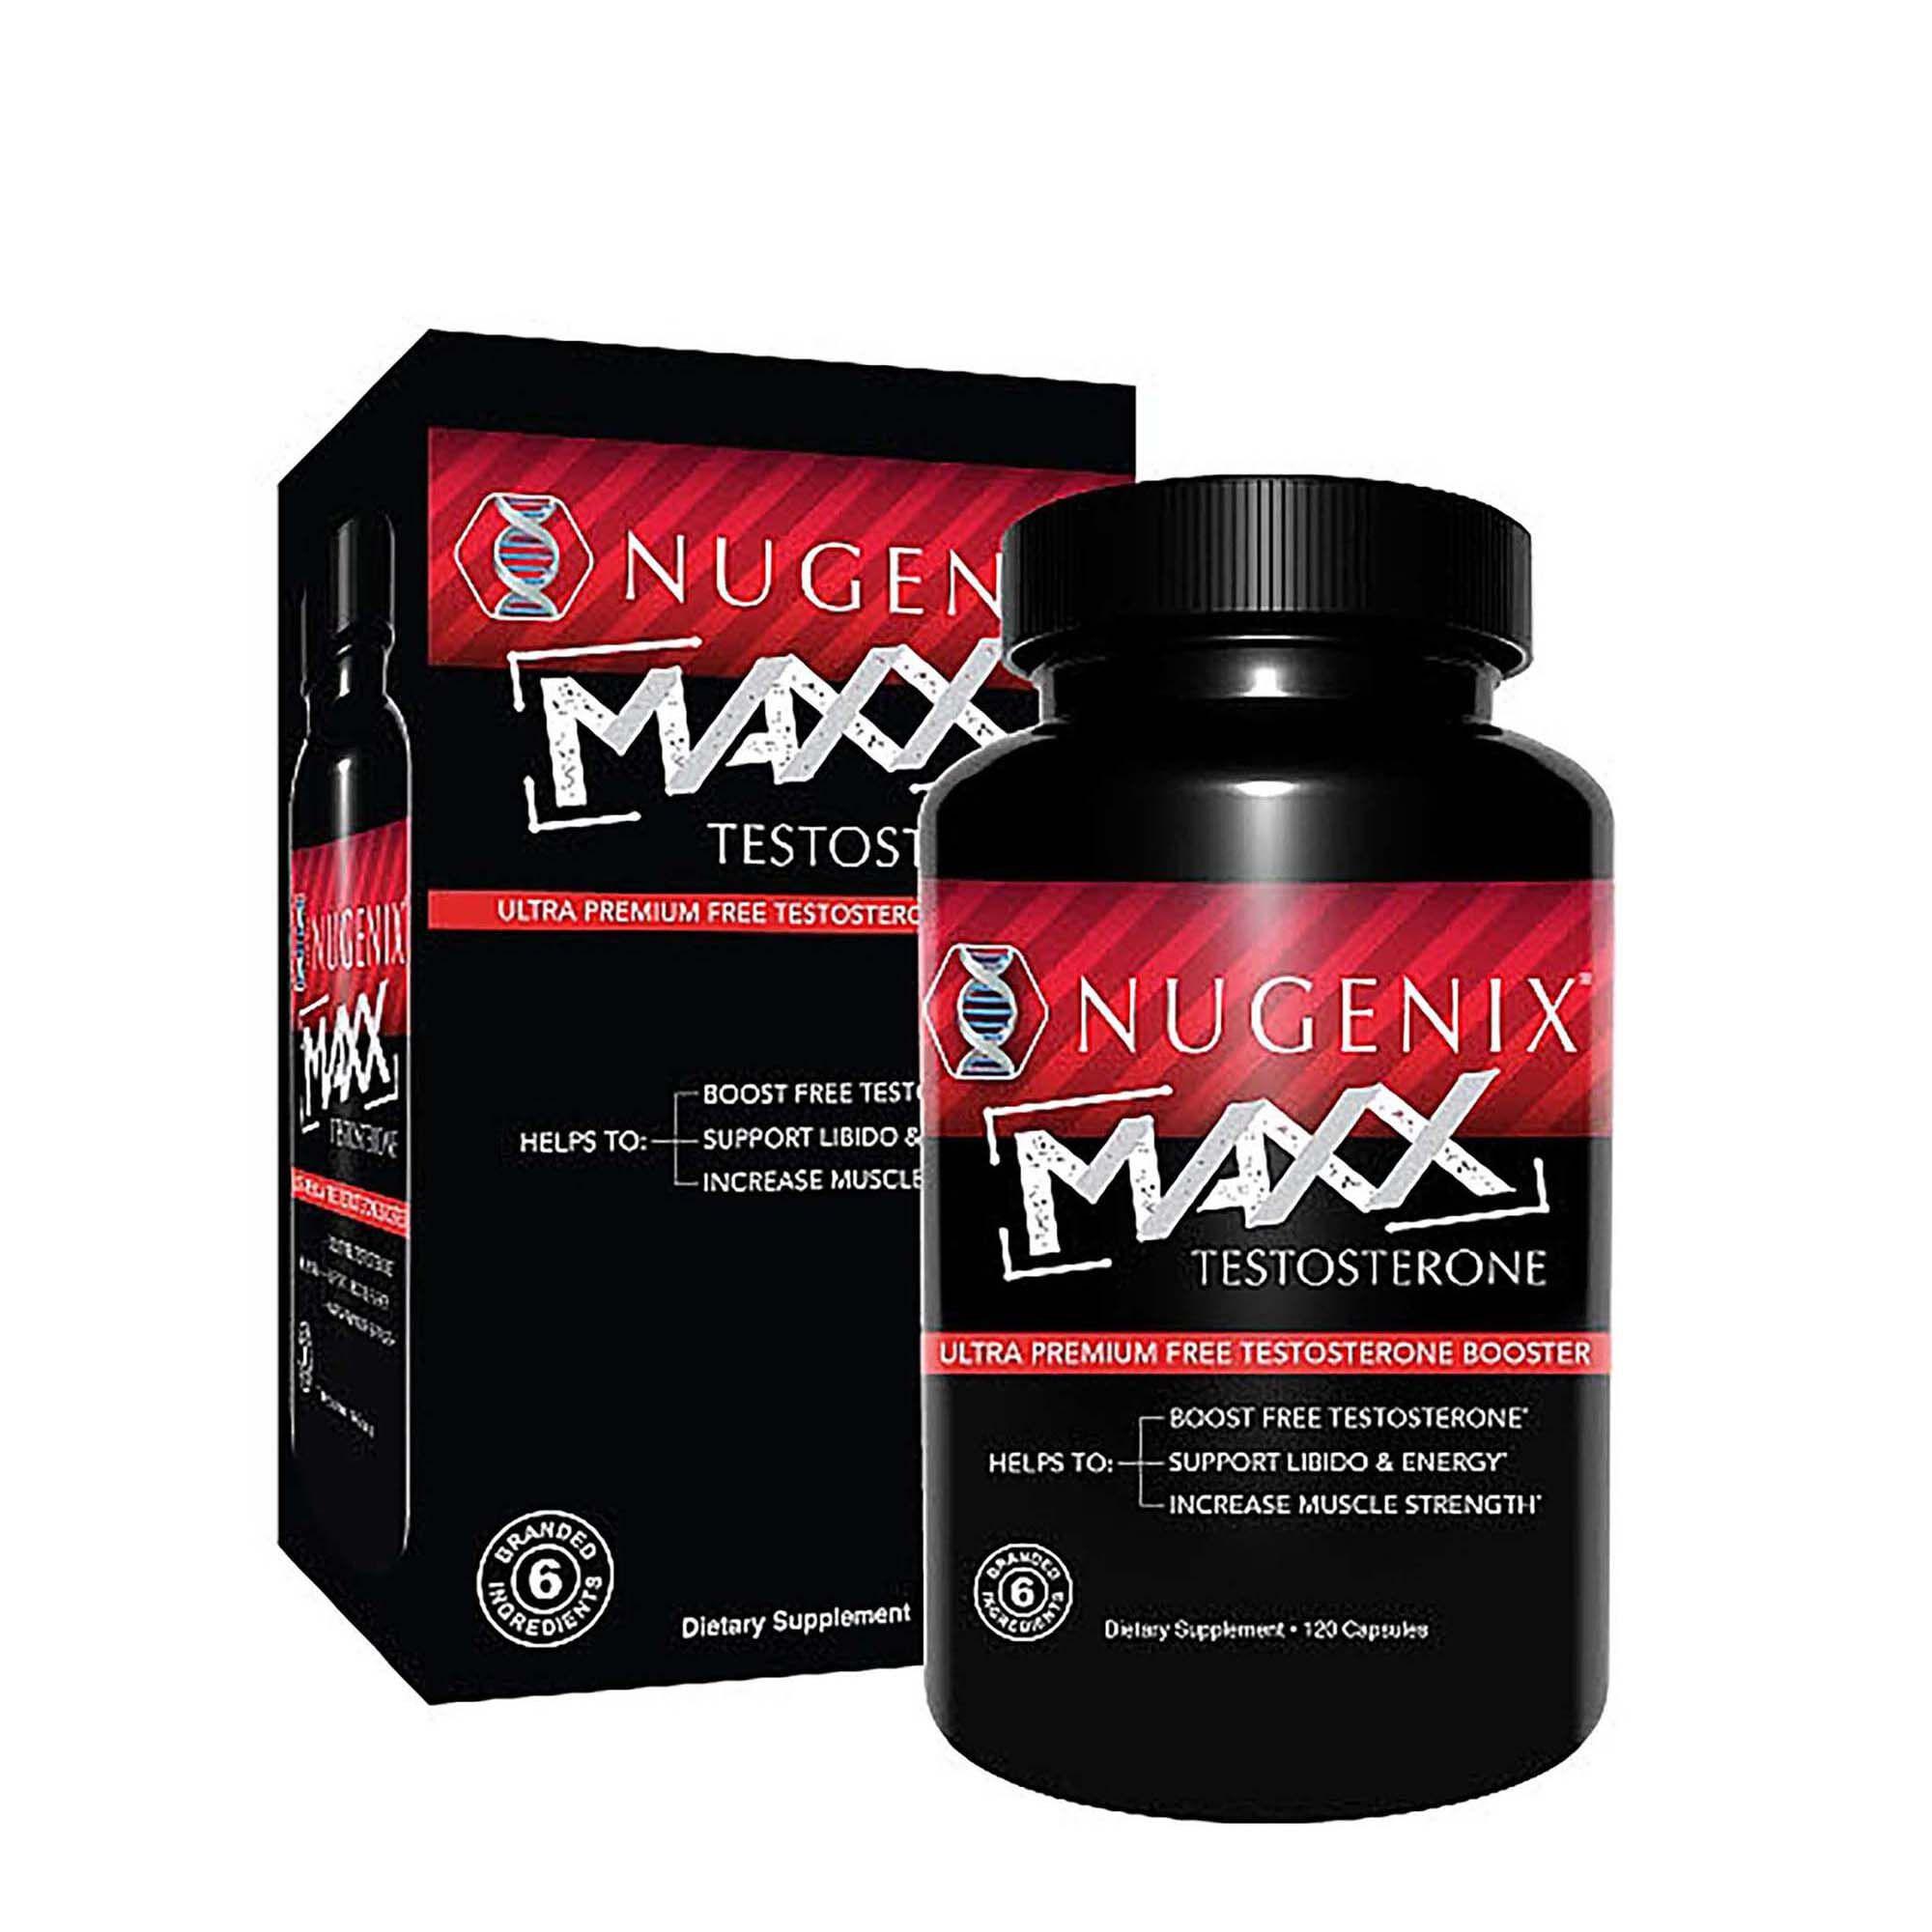 Max desire sexual enhancement for women